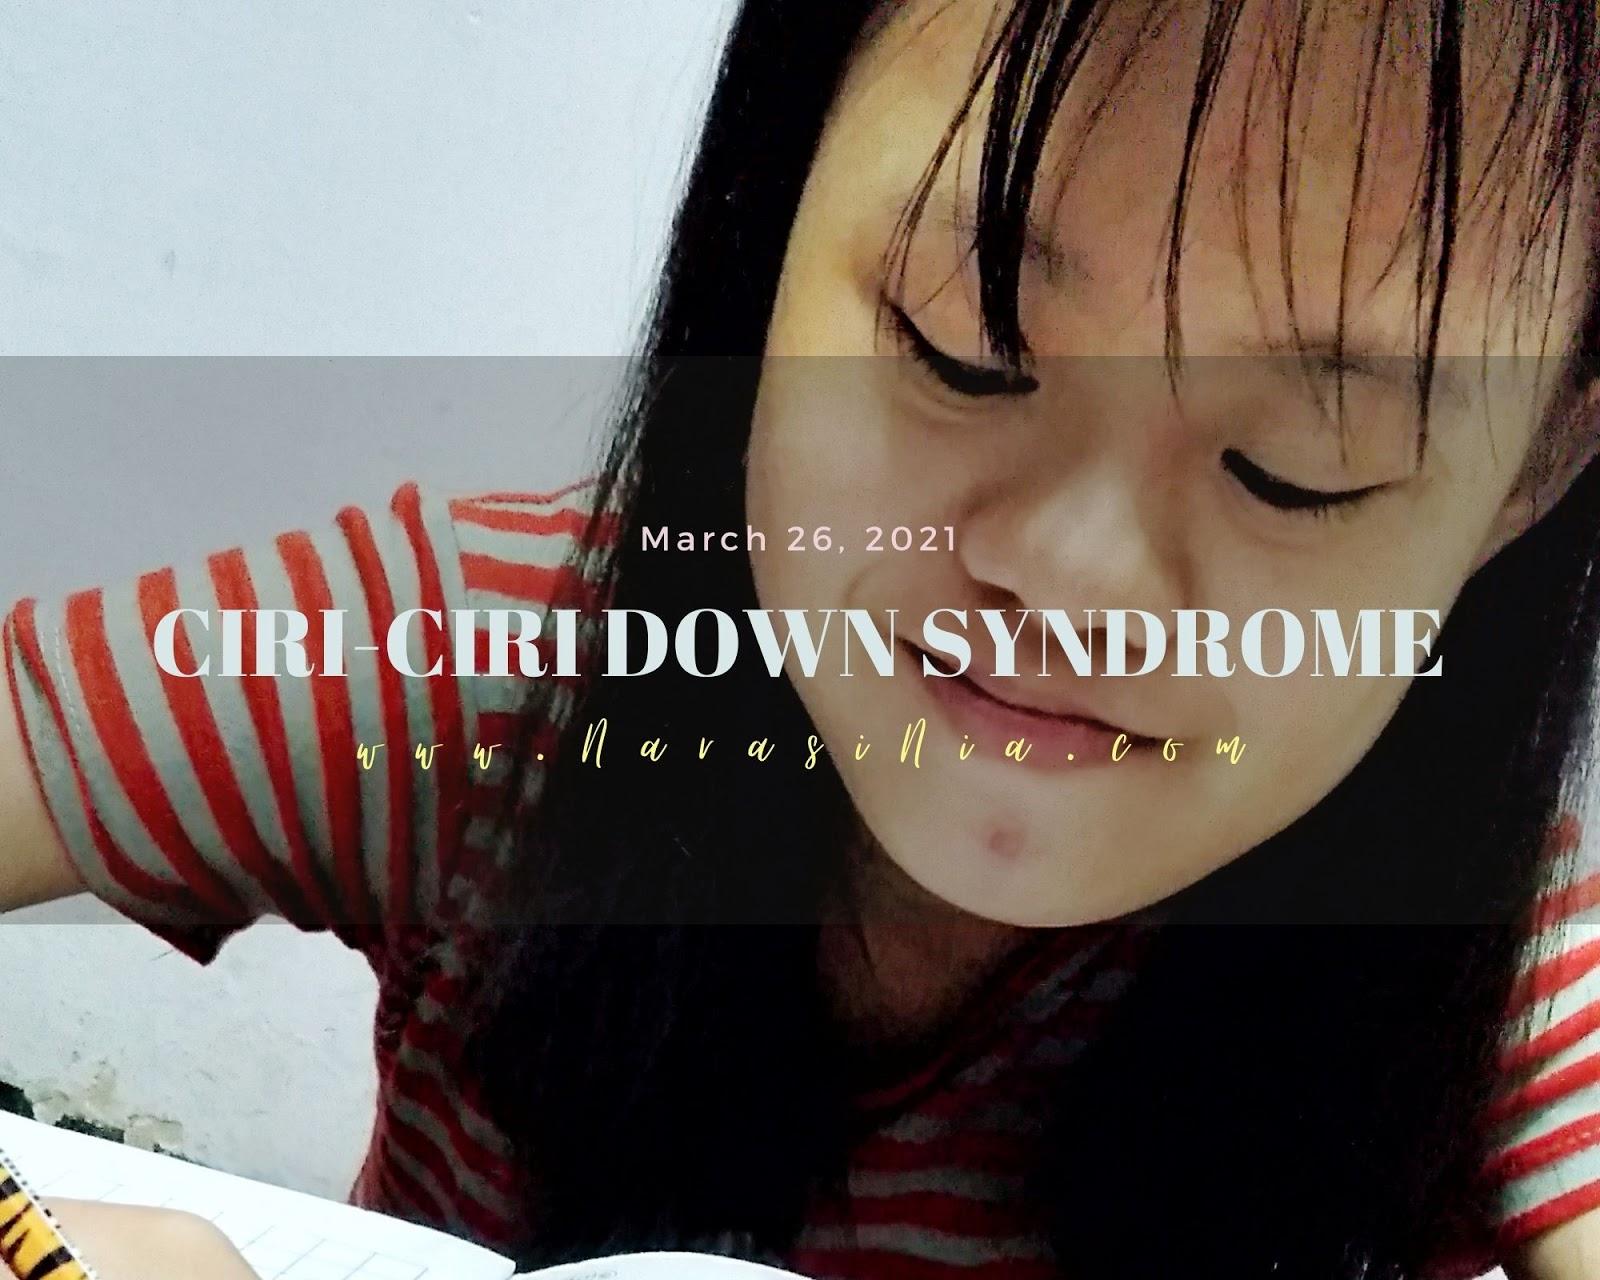 Ciri bayi down syndrome